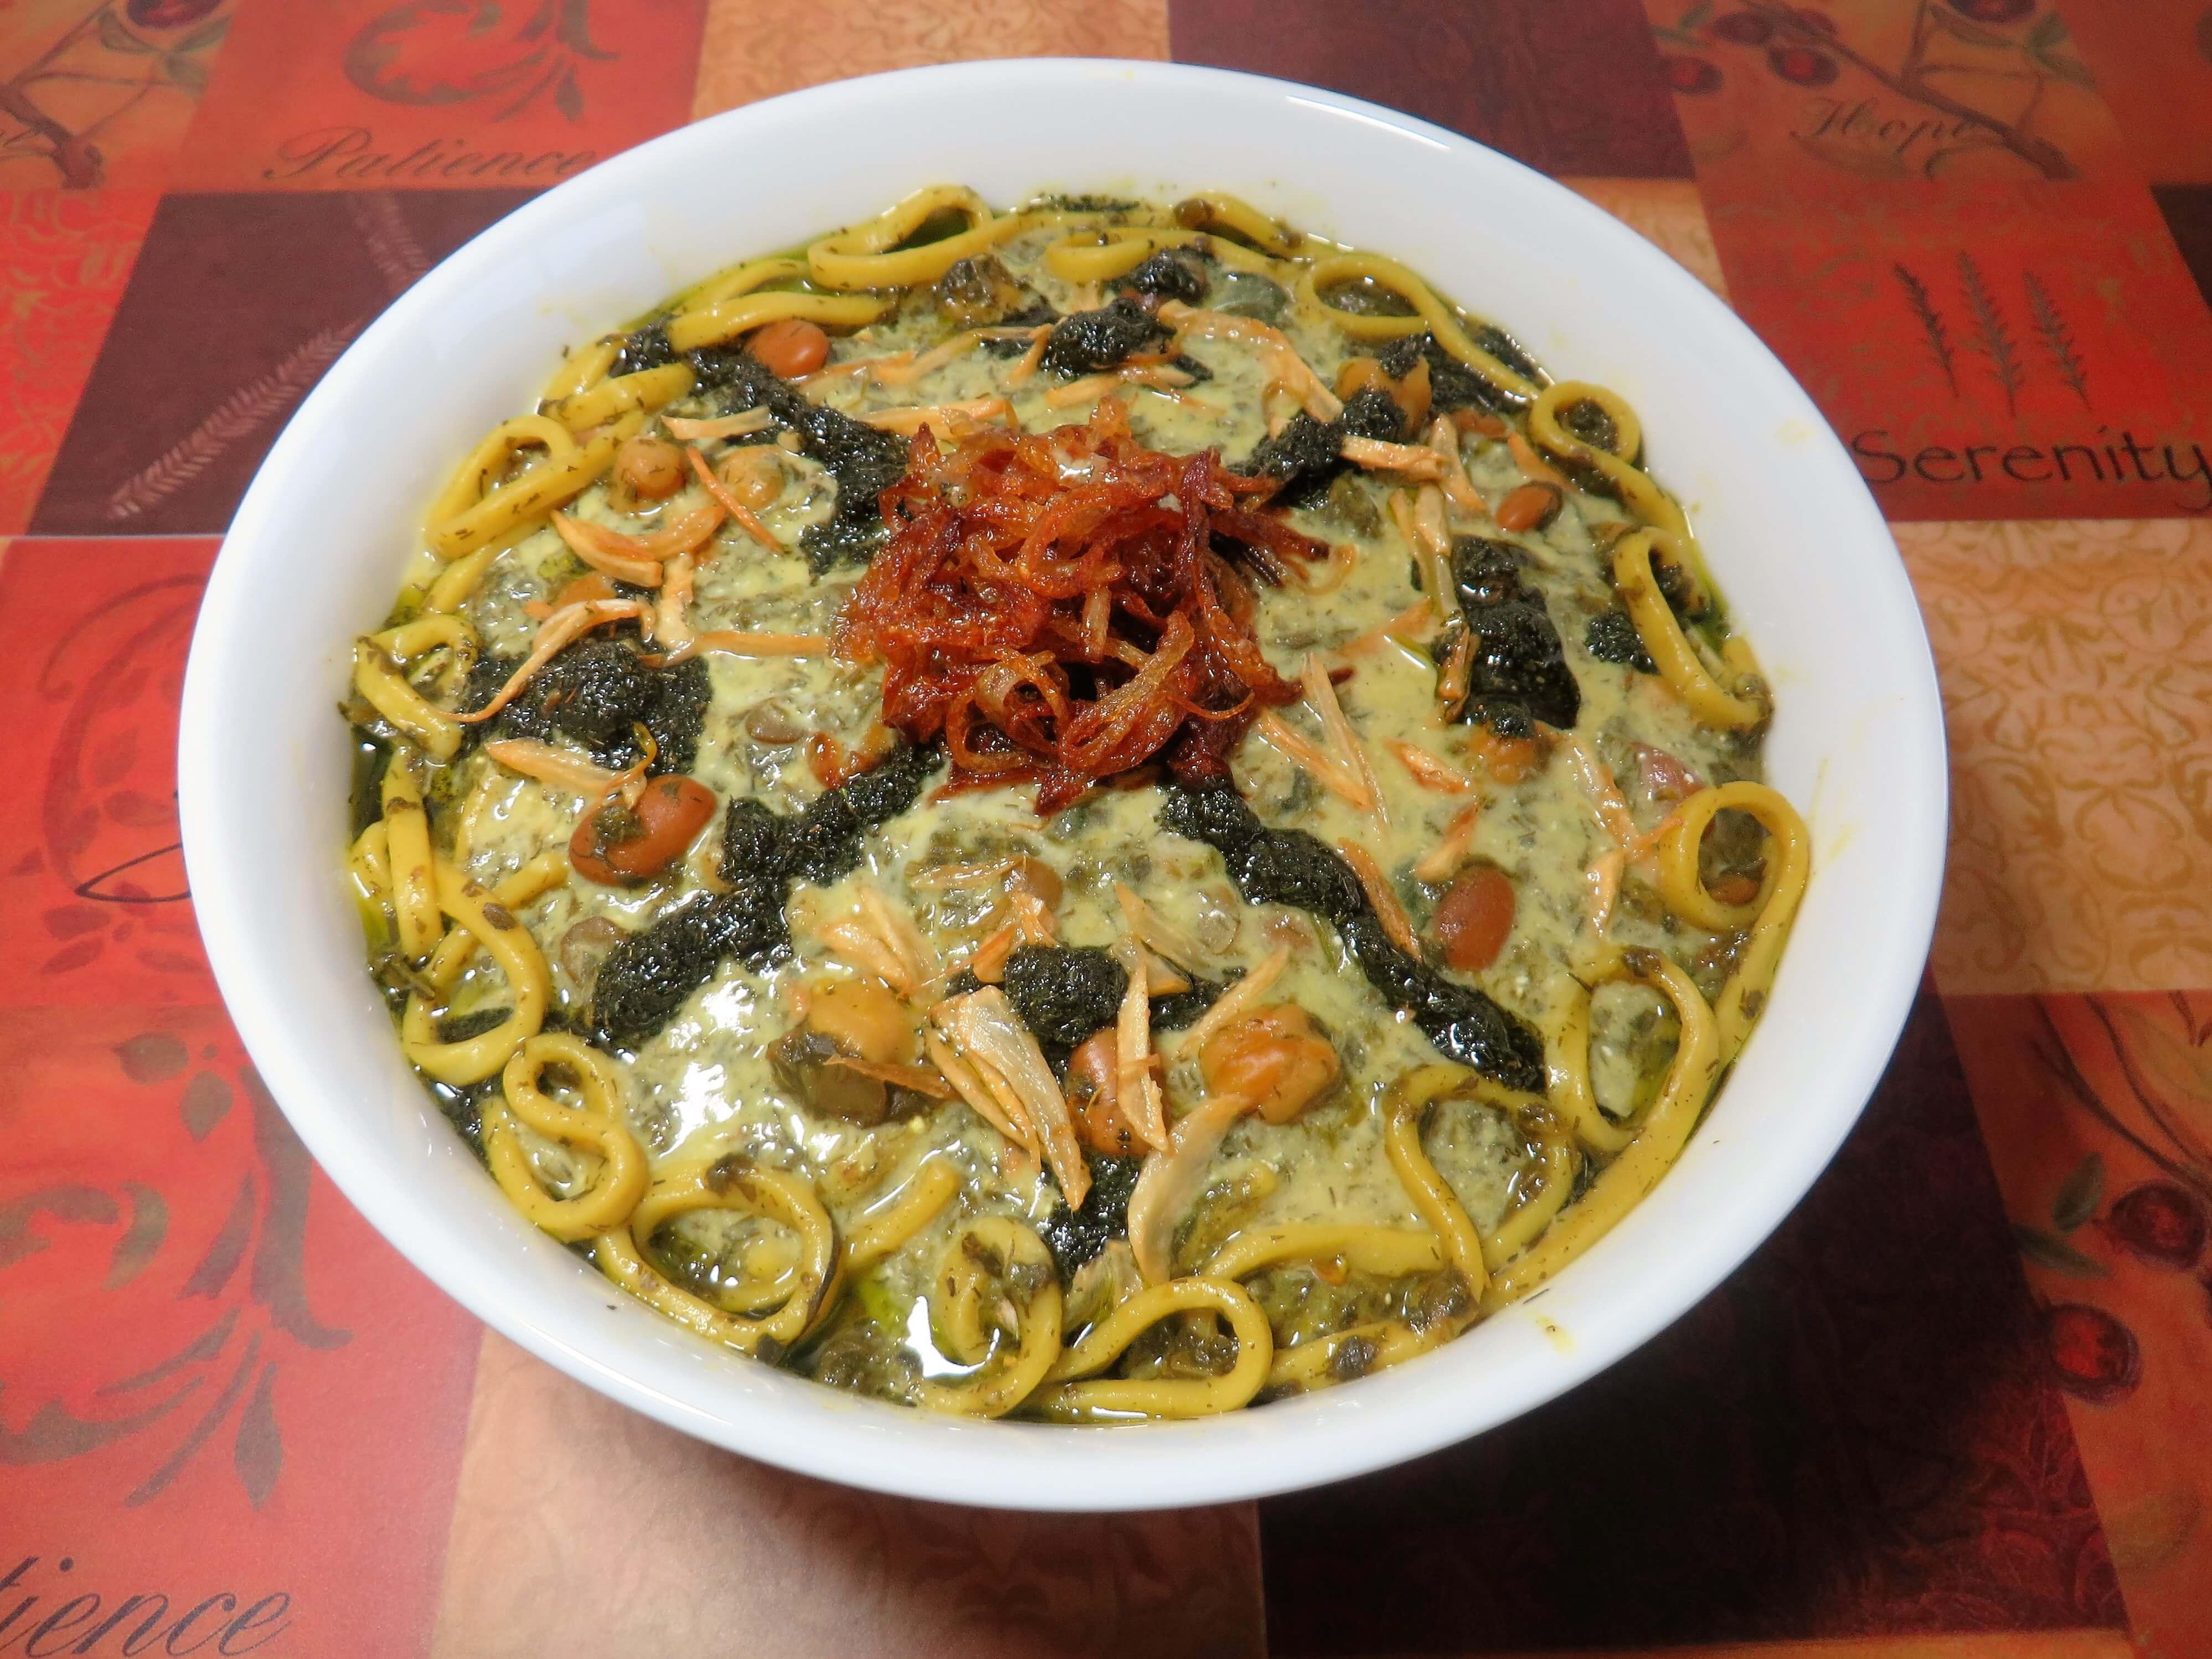 Ásh'e Reshteh • آش رشته • Herb Noodles Soup| Fae's Twist & Tango (fae-magazine.com)